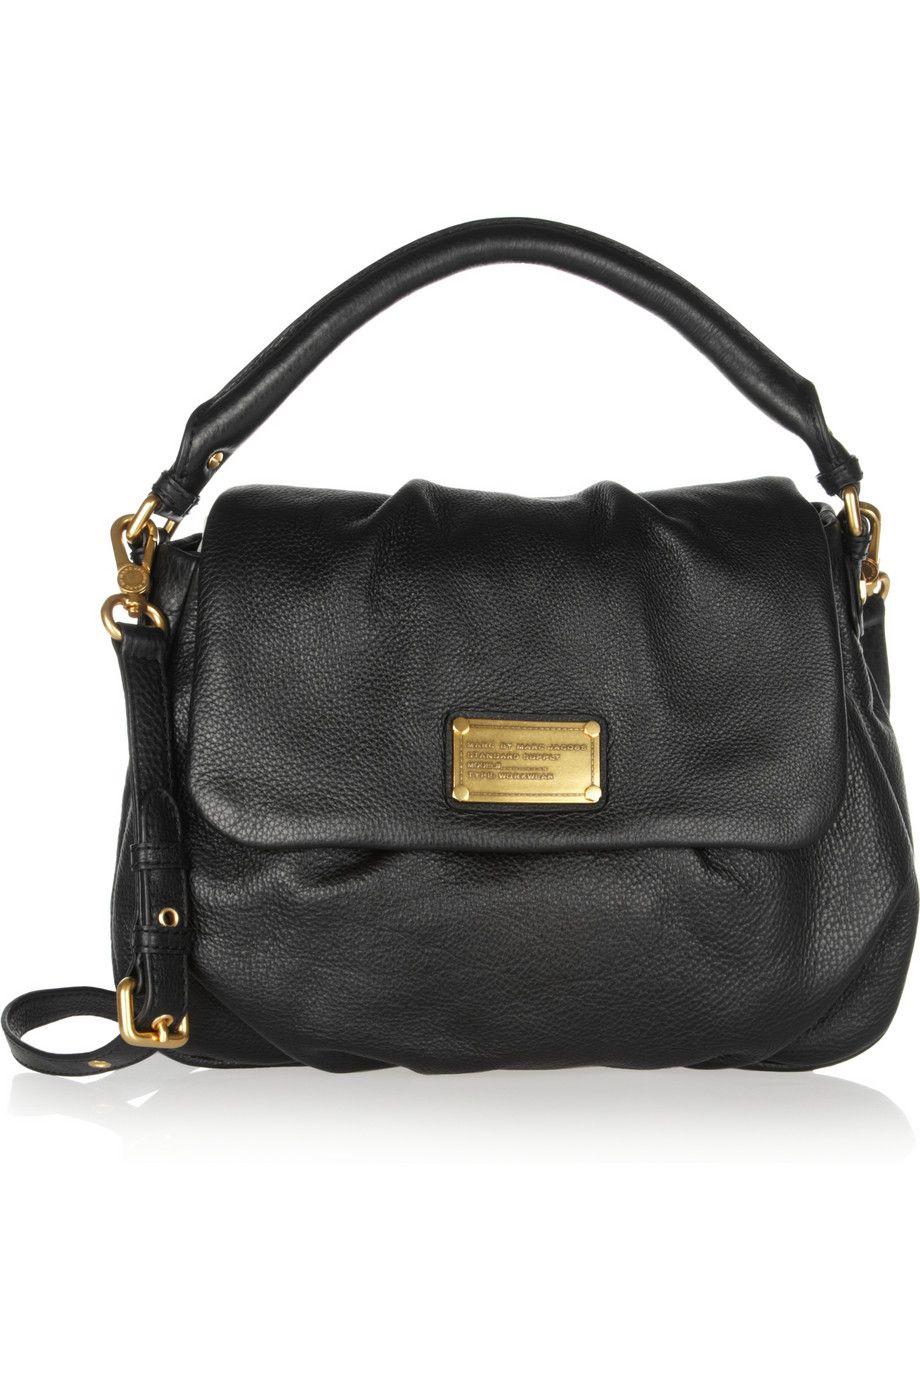 a09187a82dcb59 Marc by Marc Jacobs   Classic Q Lil Ukita textured-leather shoulder bag    NET-A-PORTER.COM